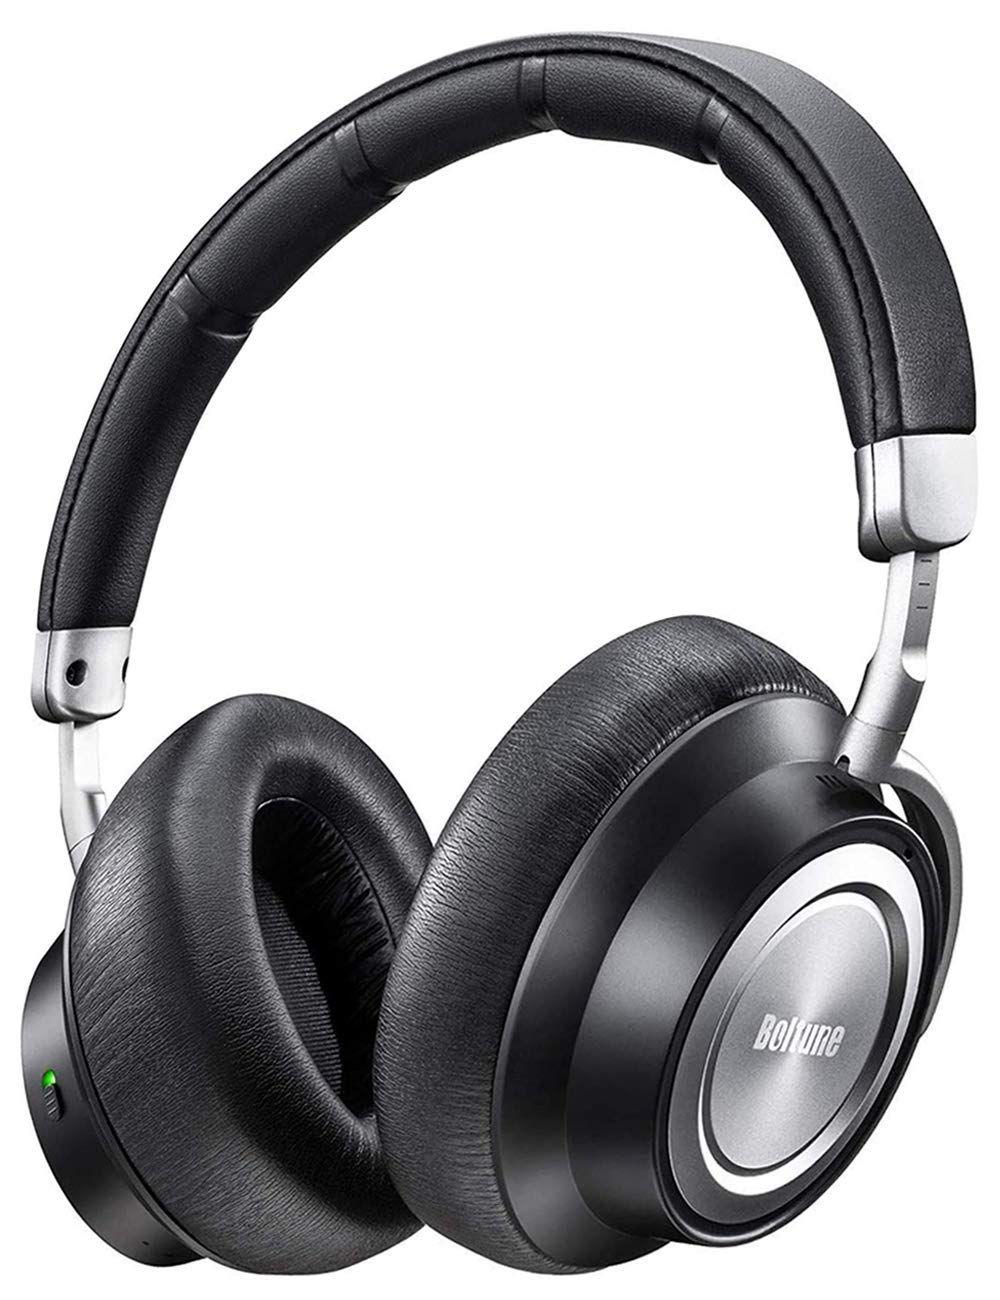 Boltune BT-BH011 Anc headphone